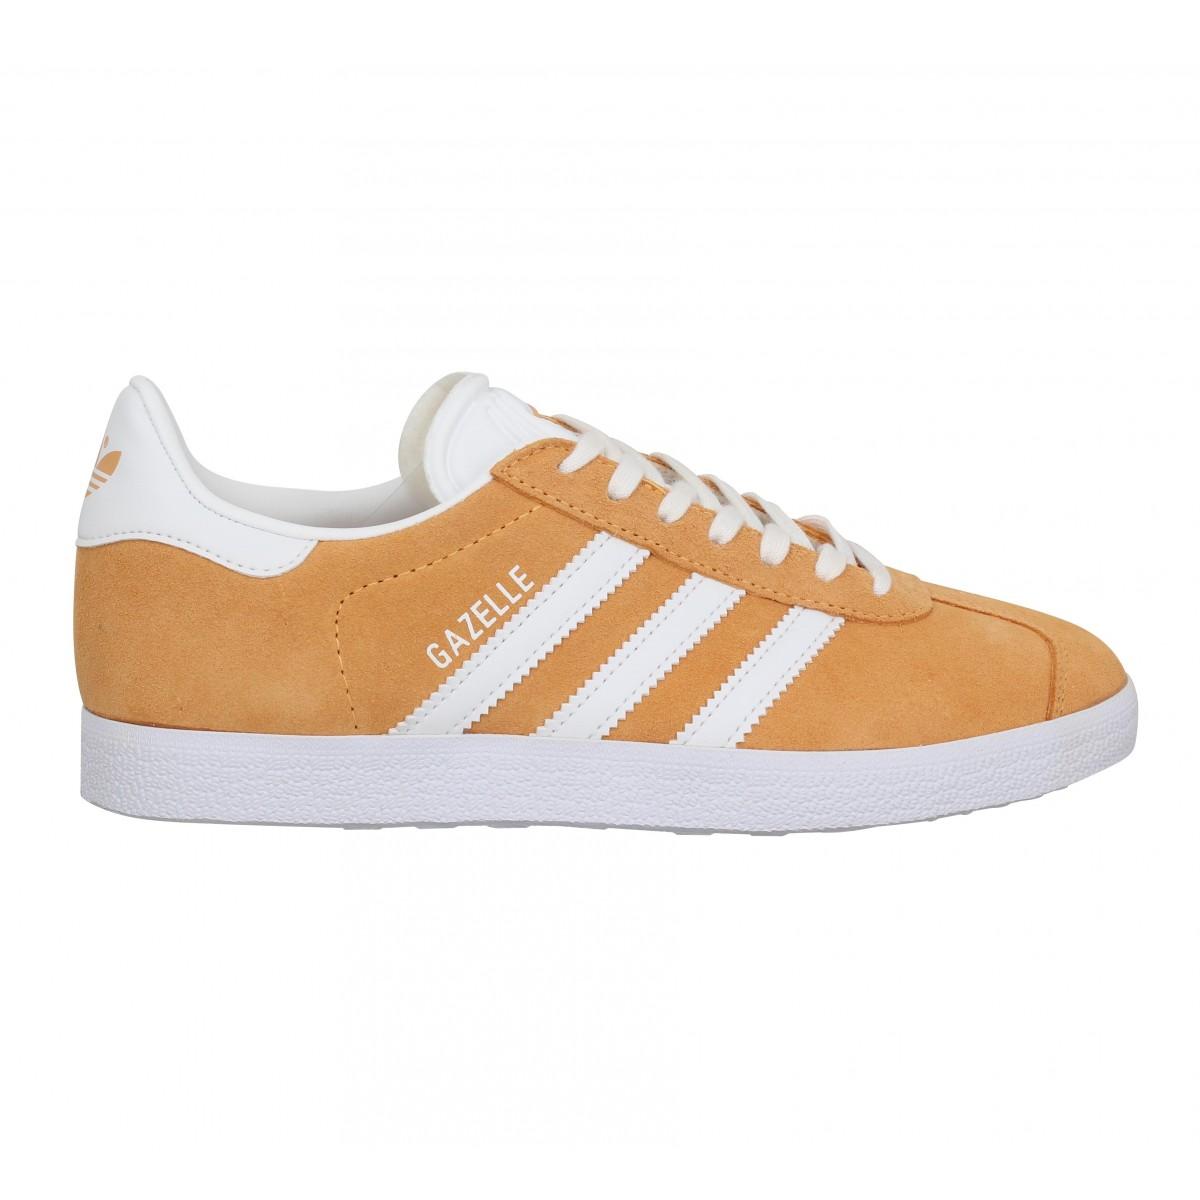 Chaussures Adidas gazelle velours femme orange brut femme | Fanny ...